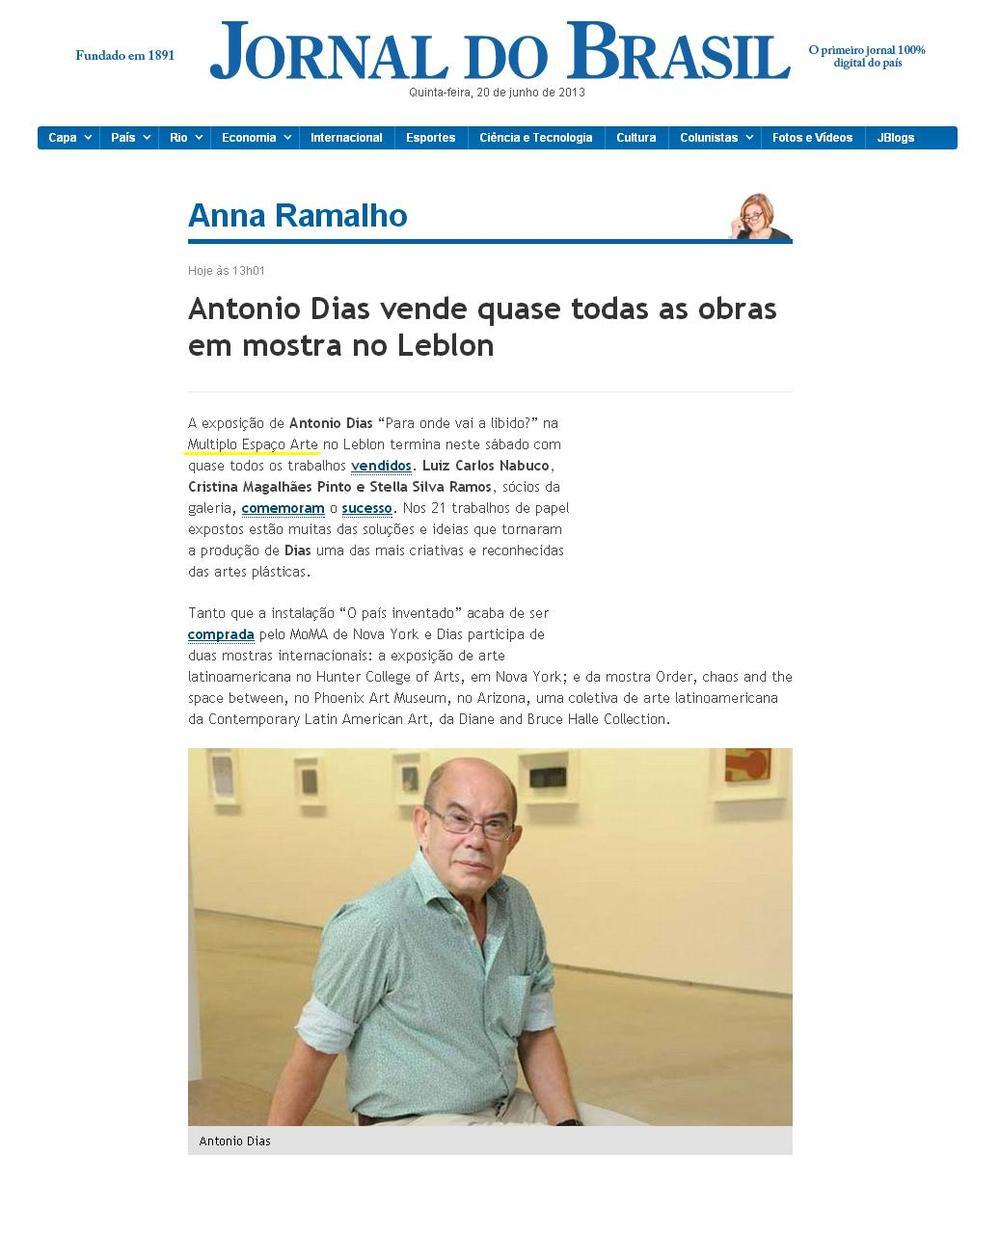 MÚL.TI.PLO ESPAÇO ARTE NO JORNAL DO BRASIL 20.06.2013.JPG